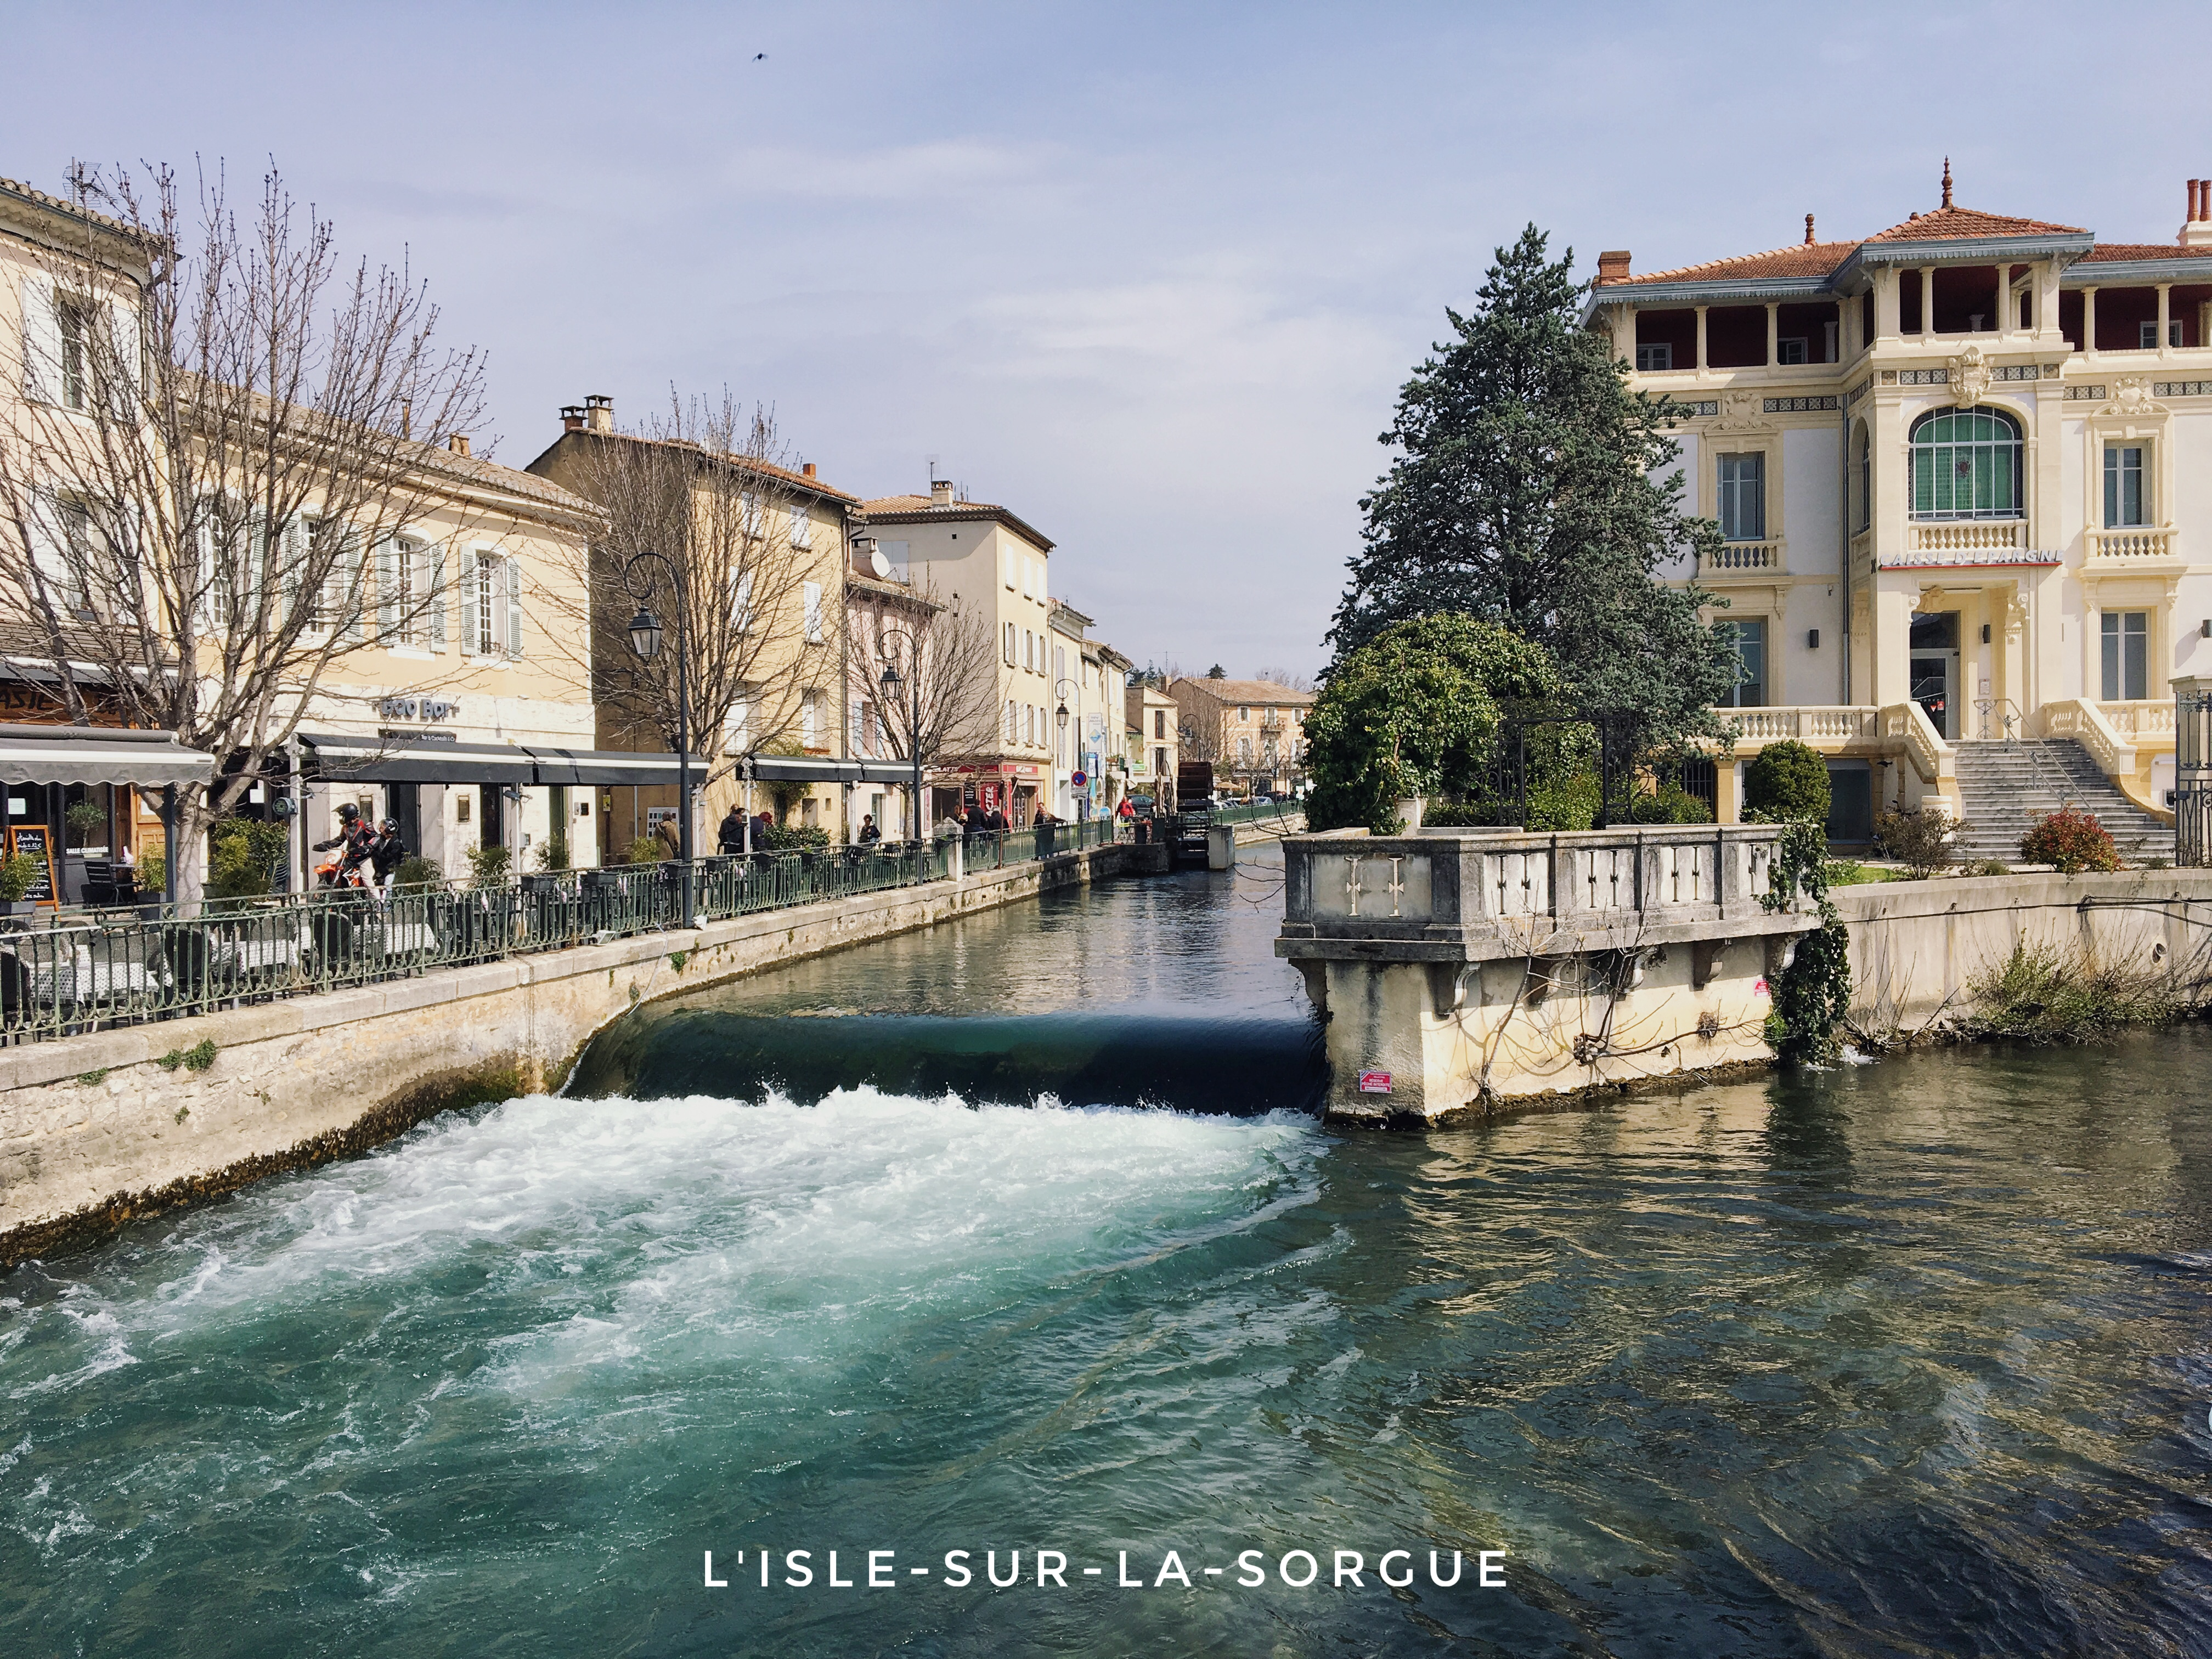 【法國】普羅旺斯萊博:自由行全攻略 Les Baux-de-Provence Travel Guide